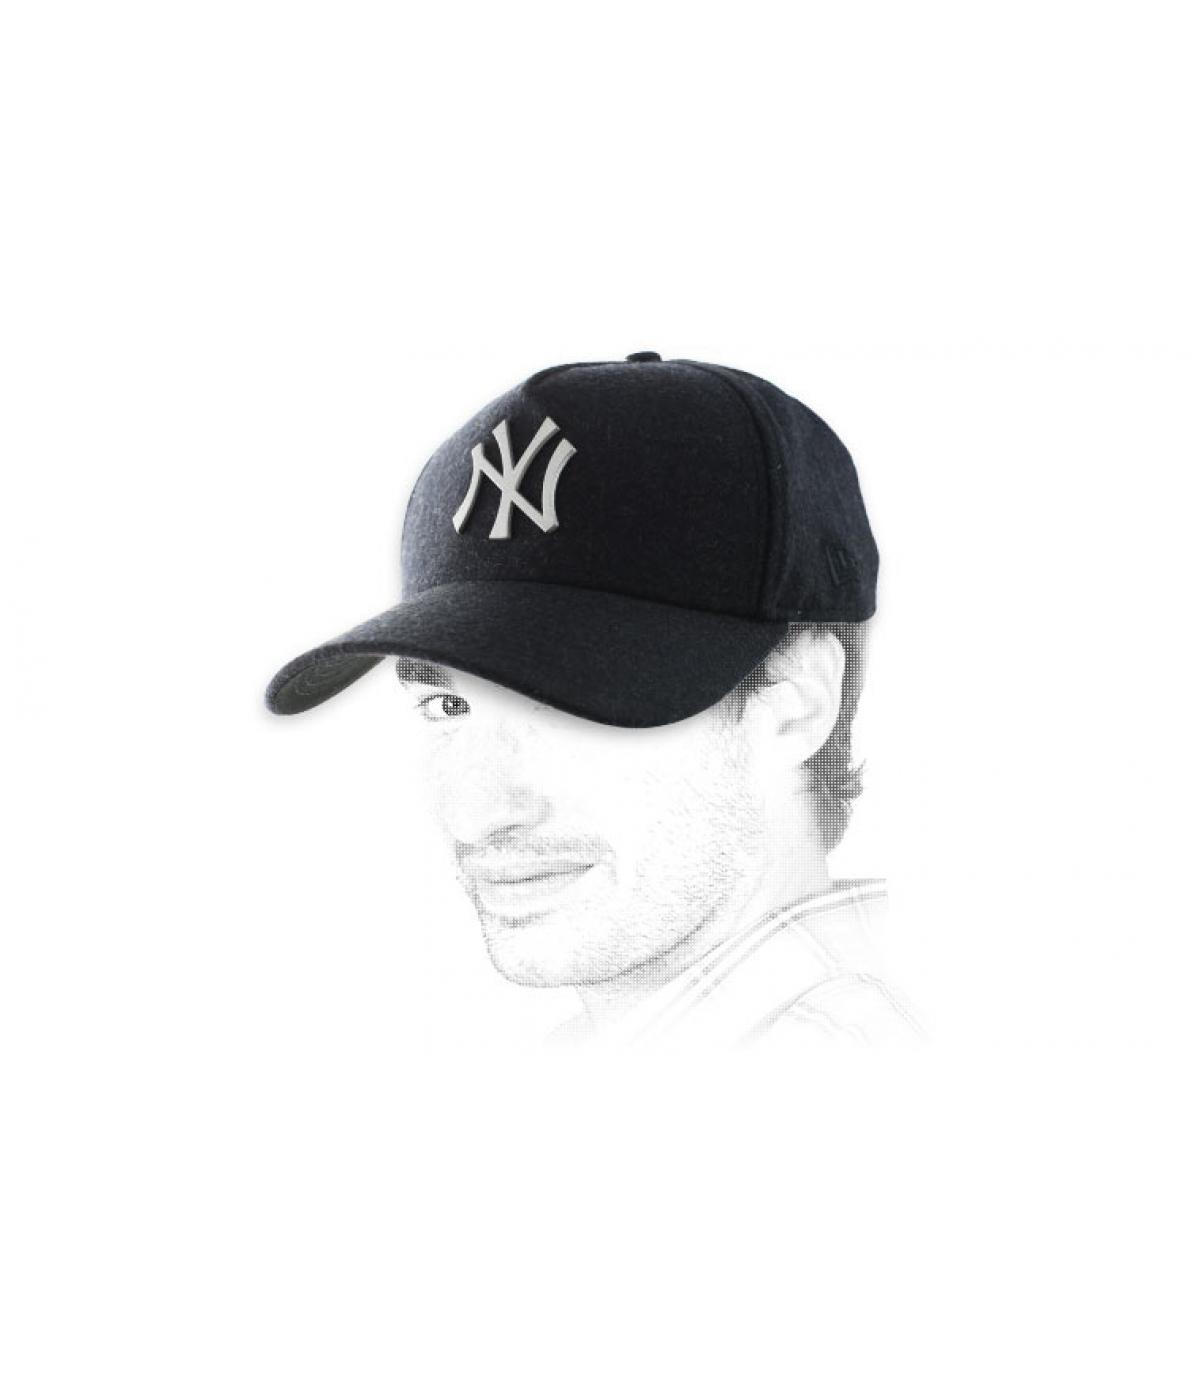 metal logo black NY cap